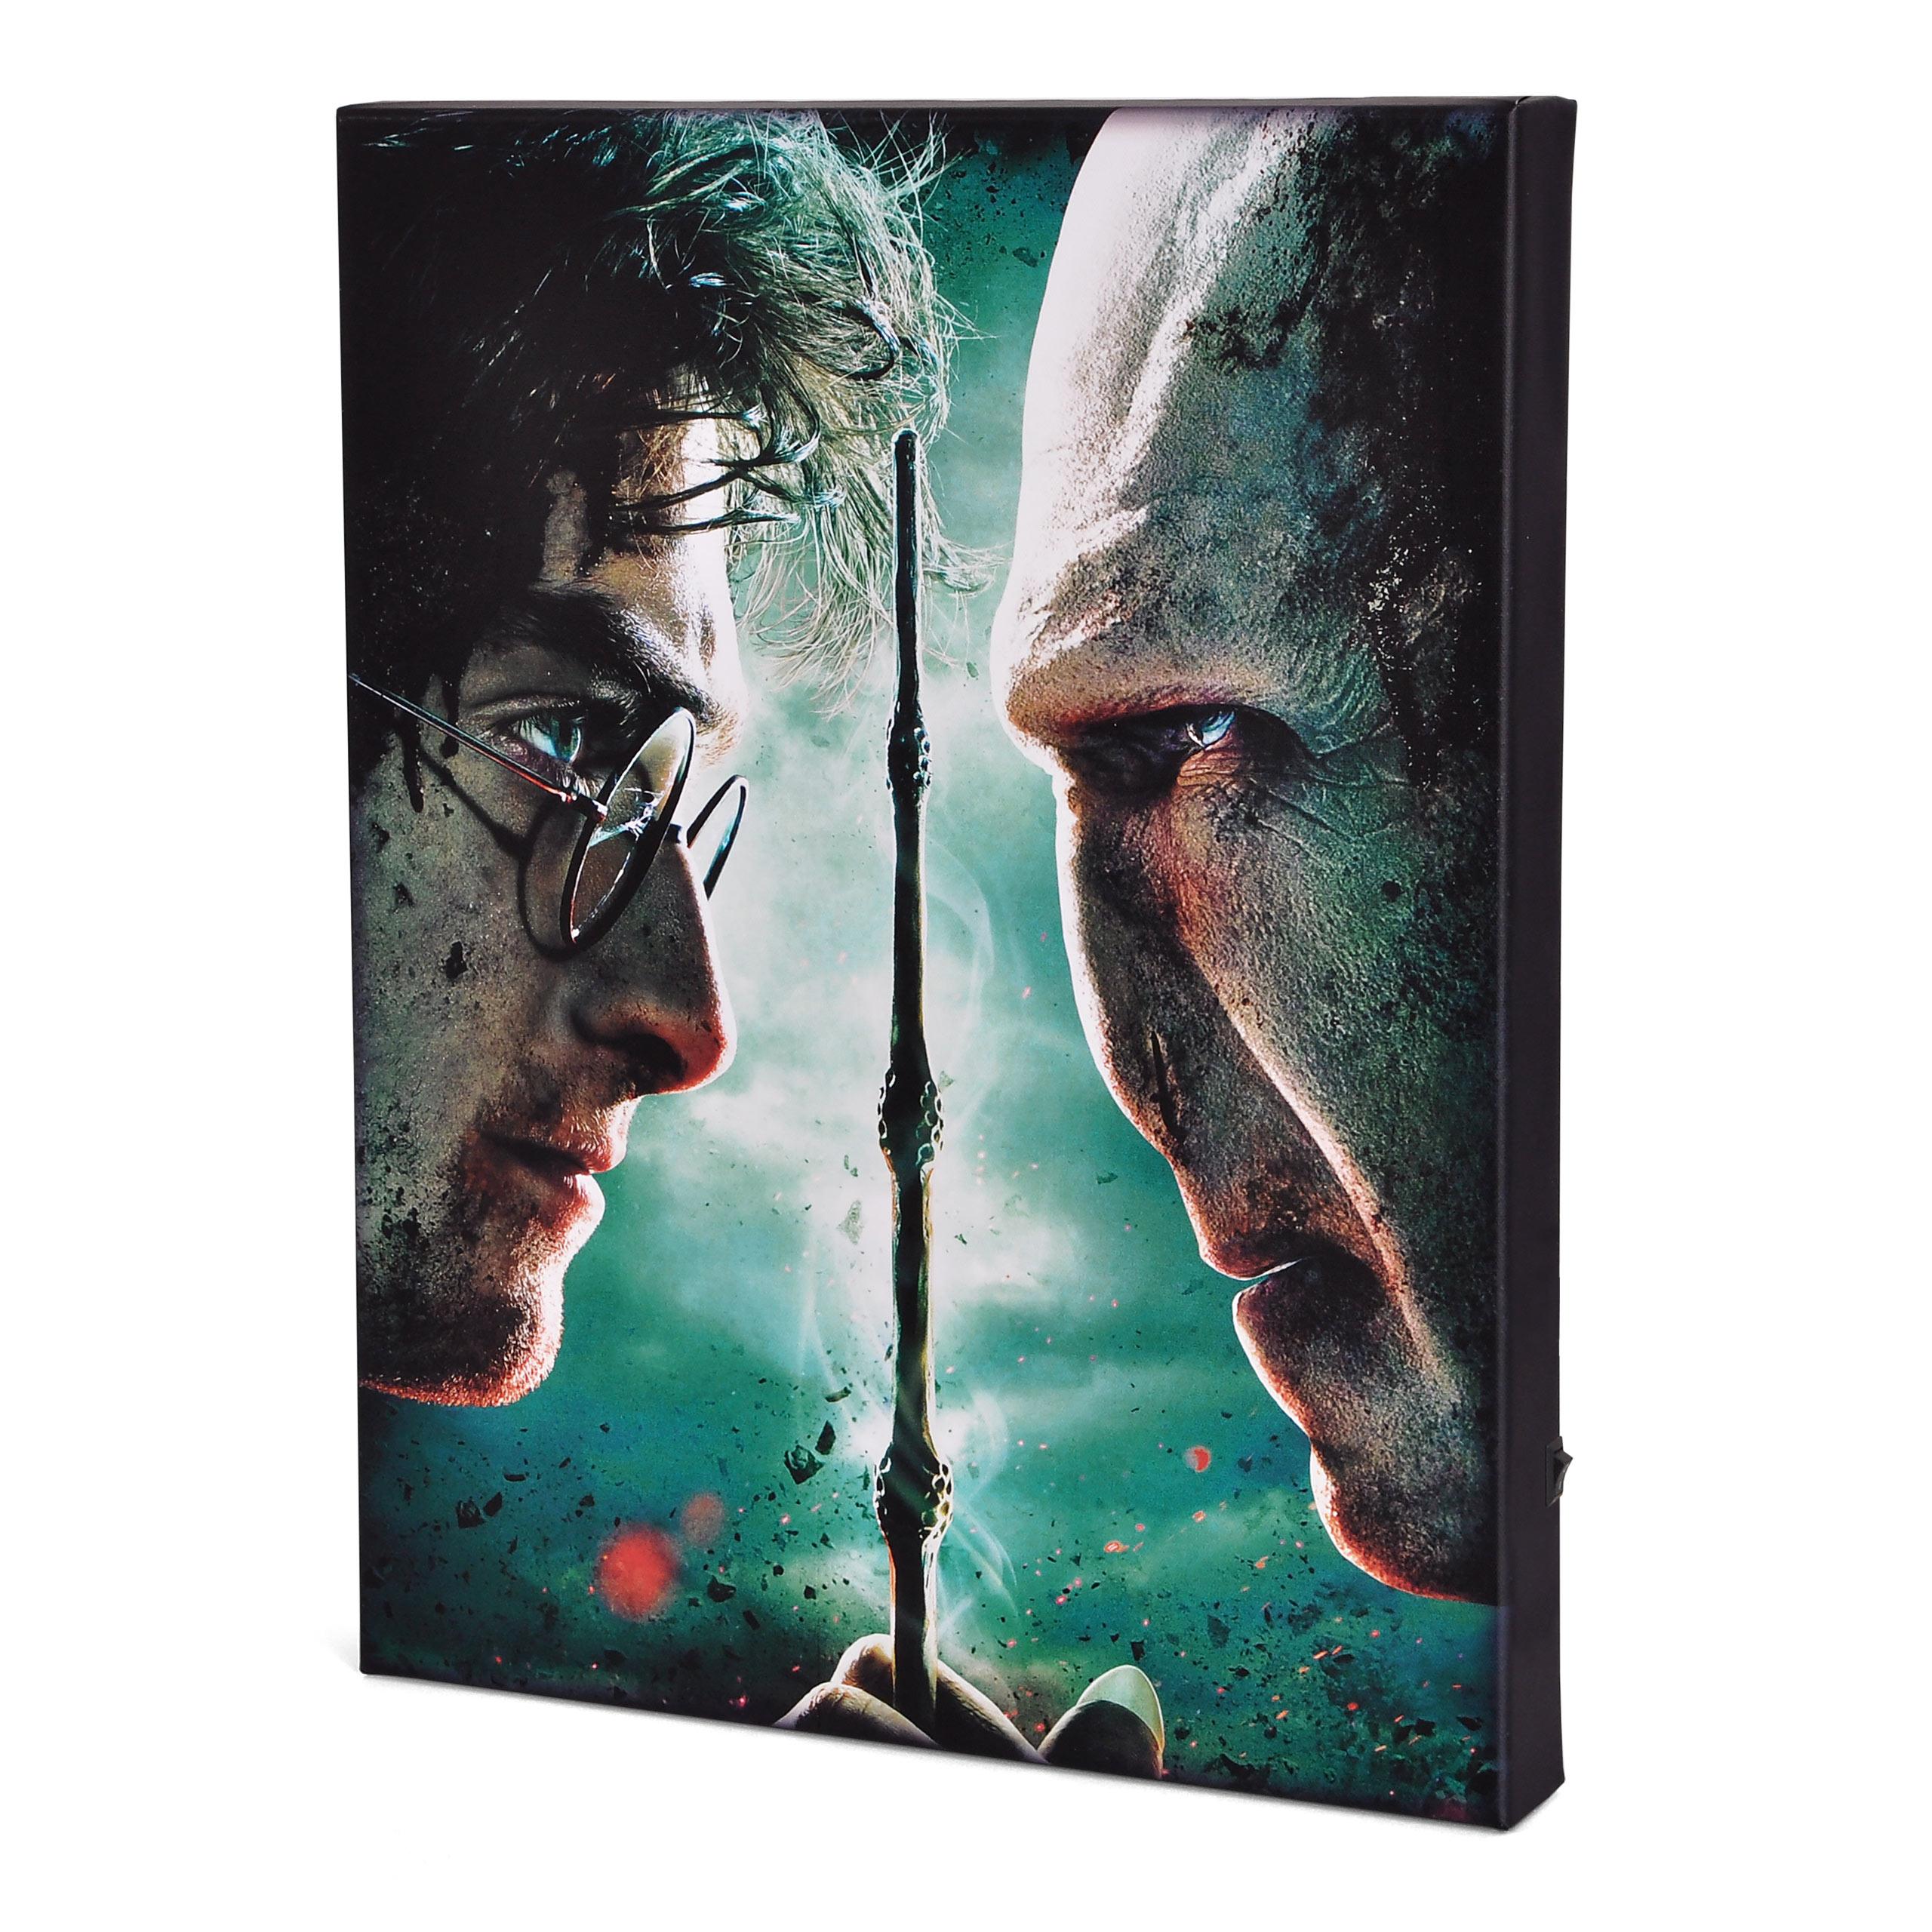 Harry Potter - Harry vs. Voldemort Wandbild mit Licht